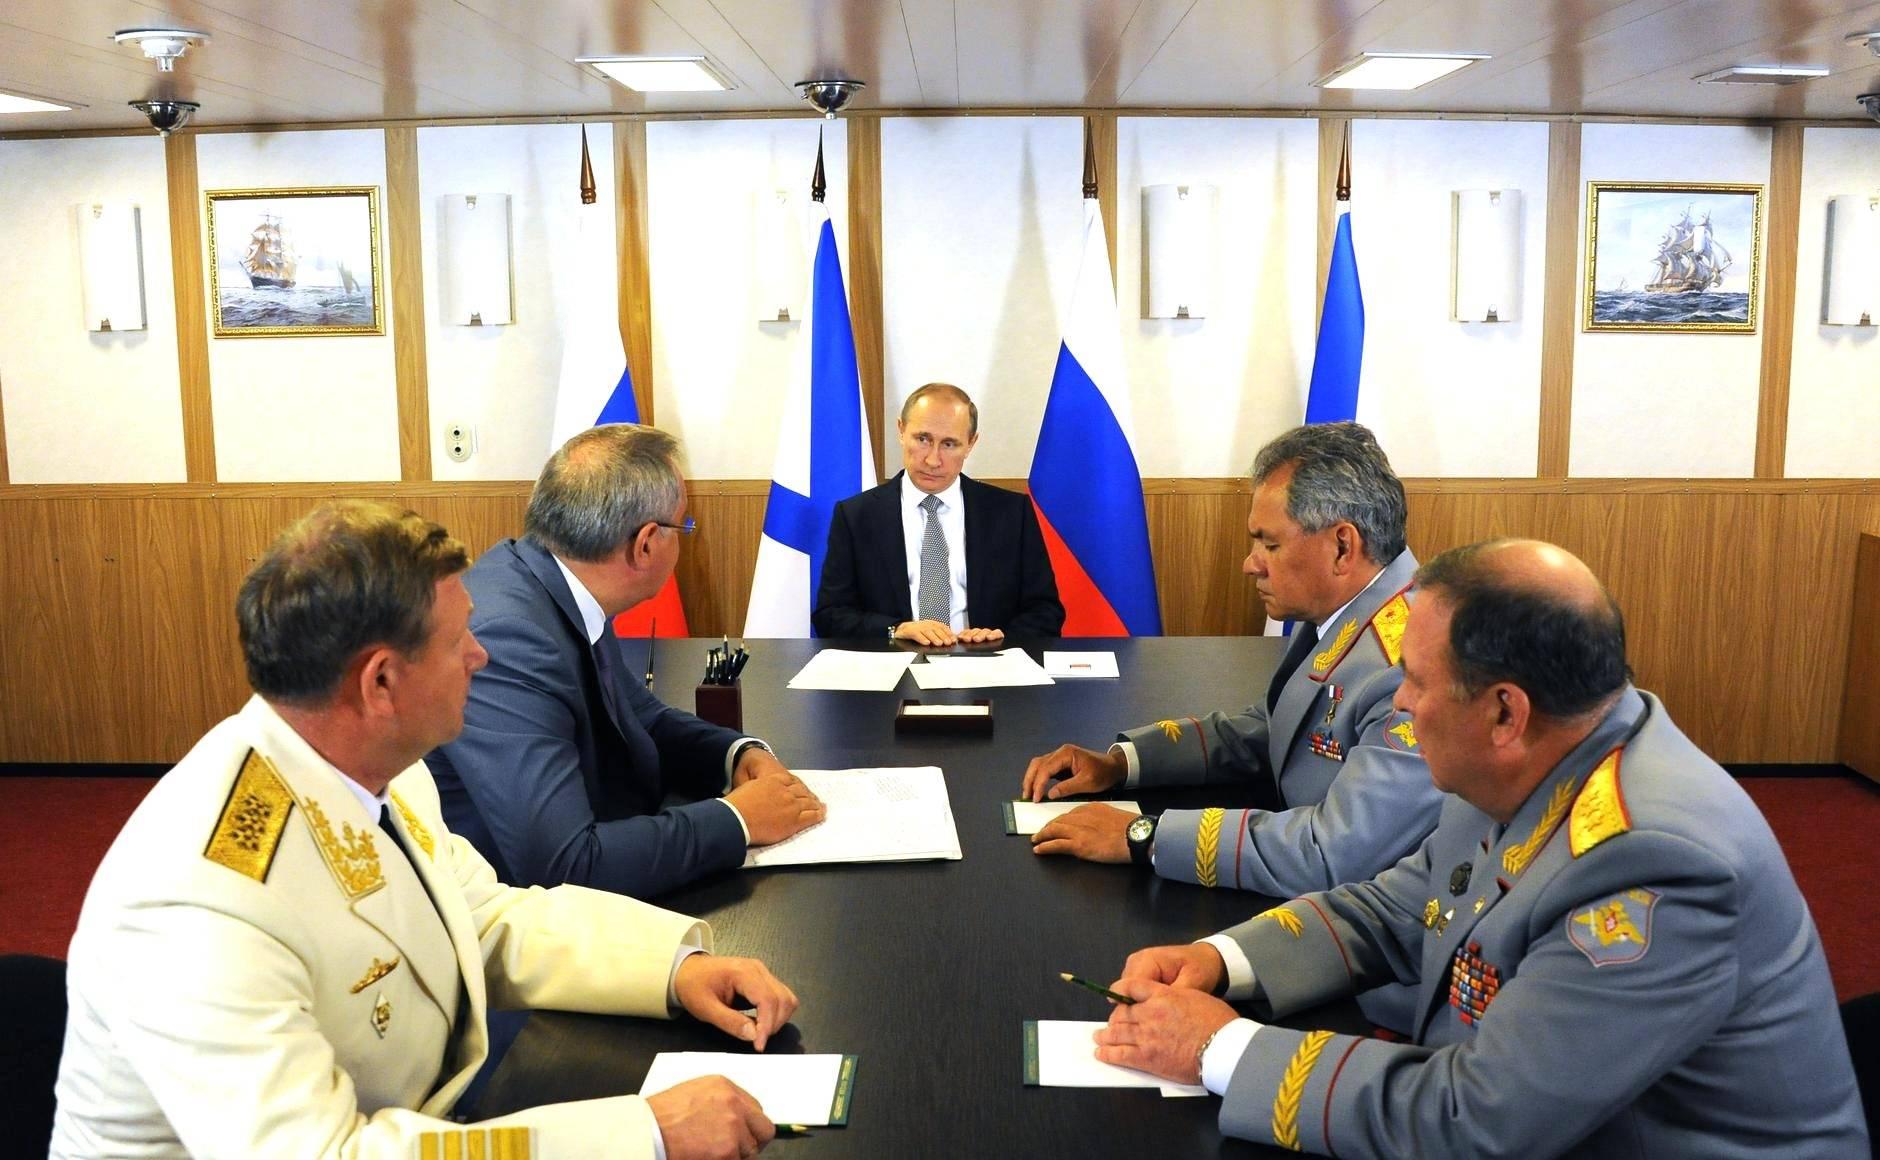 From let to right: Victor Chirkov, Dmitri Rogozin, Vladimir Putin, Sergei Shoigu and Anatolii Sidorov